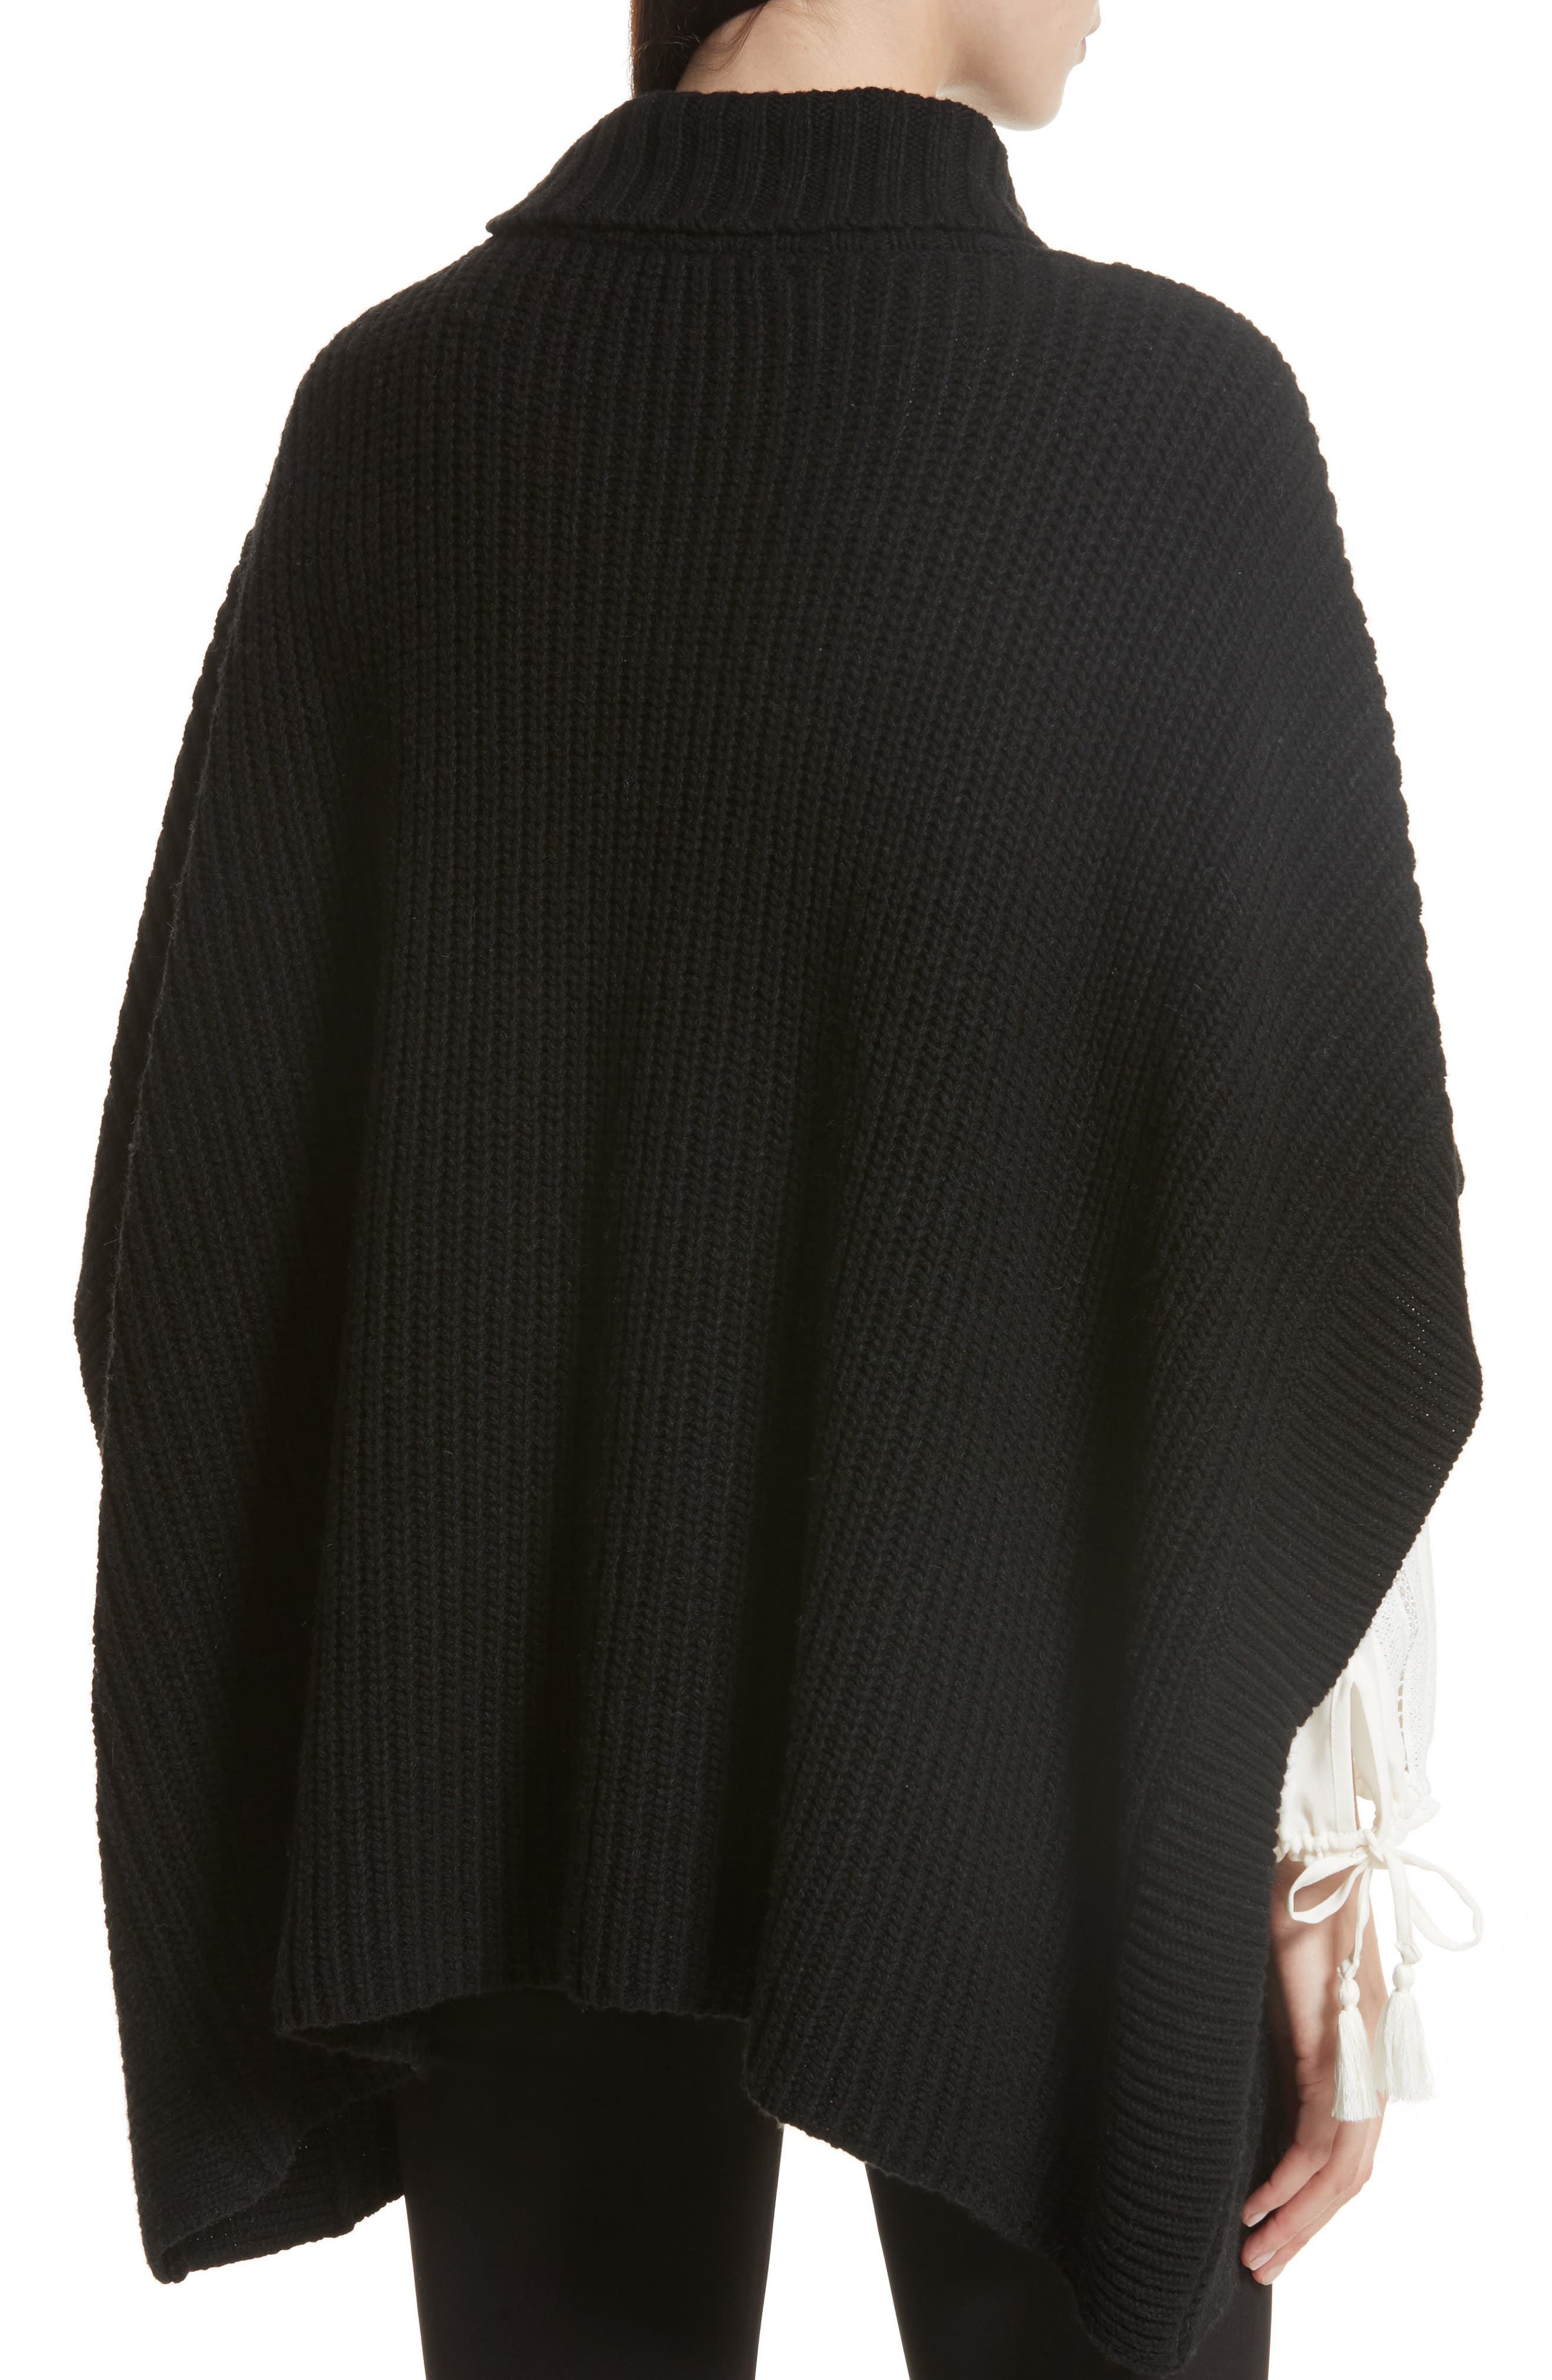 Serina Oversize Sweater,                             Alternate thumbnail 2, color,                             007